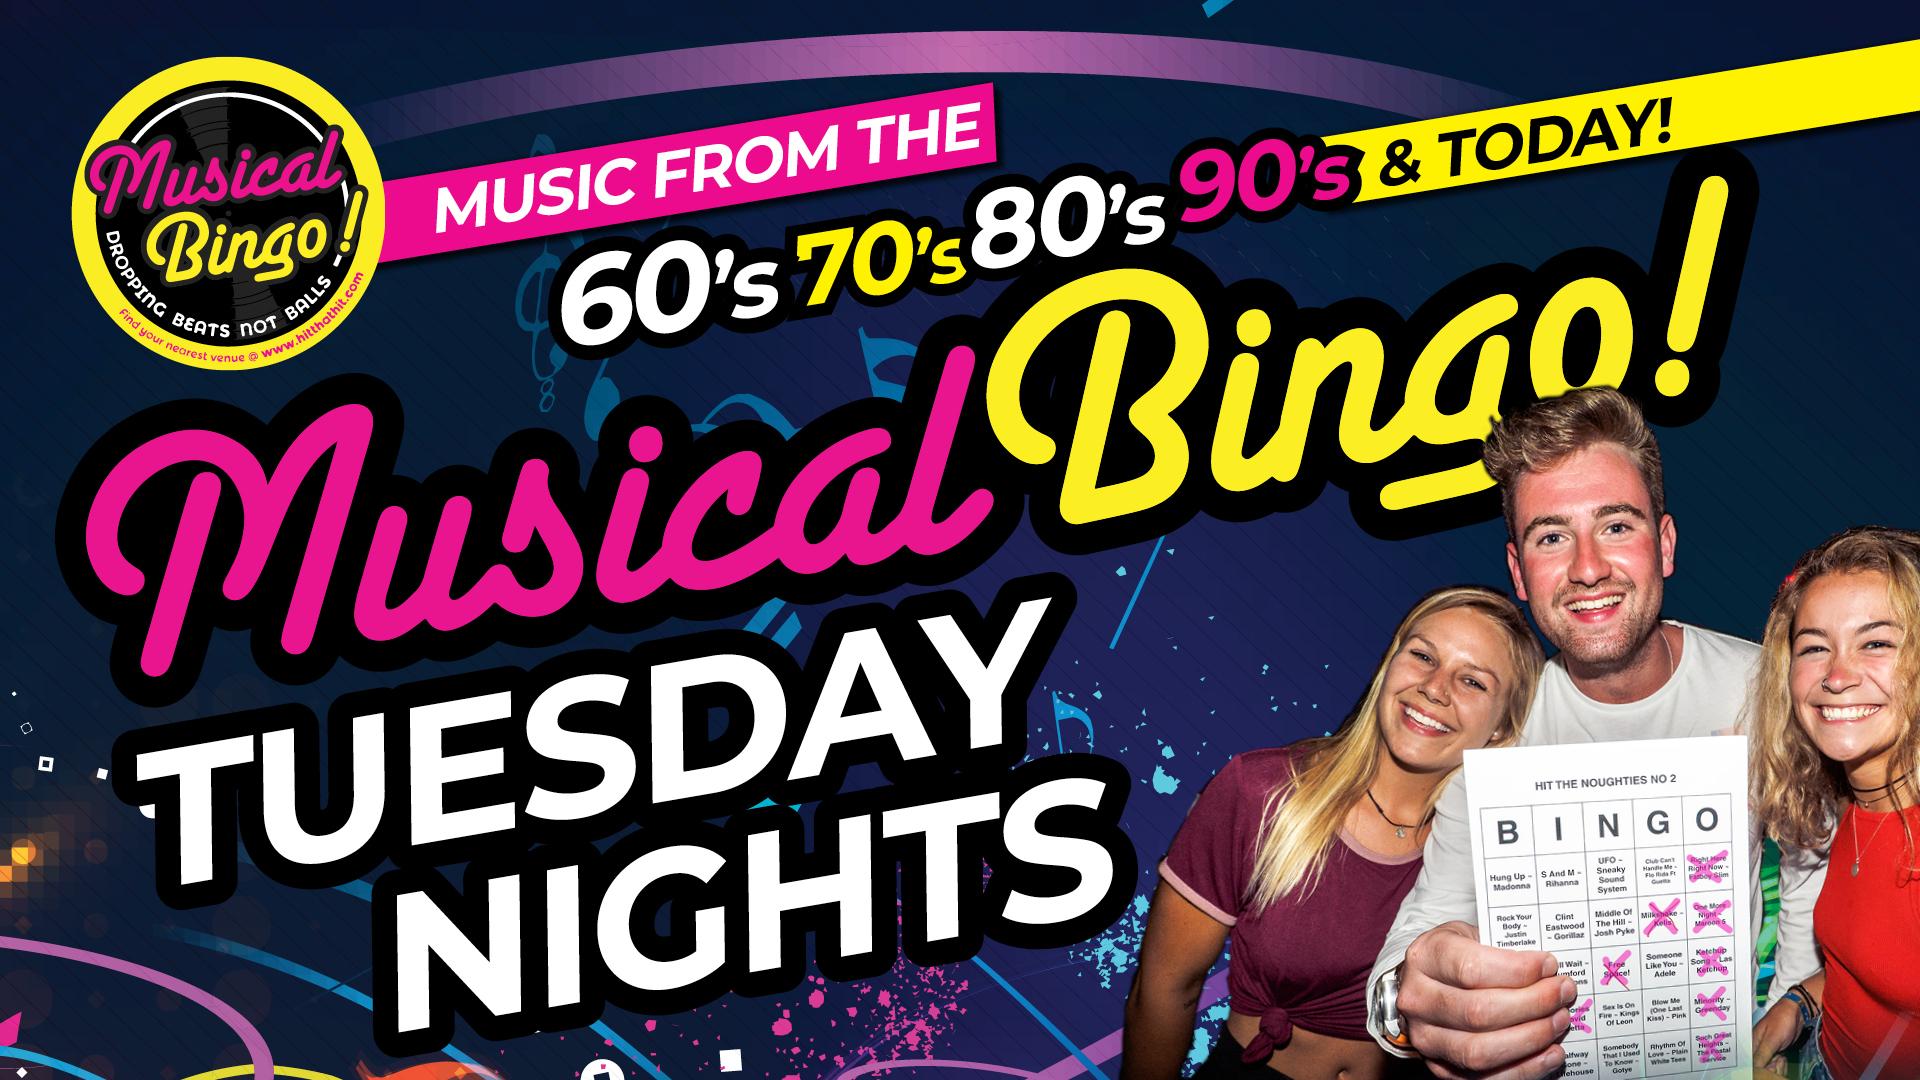 Musical Bingo Nightlife Graphic - Tuesday.jpg